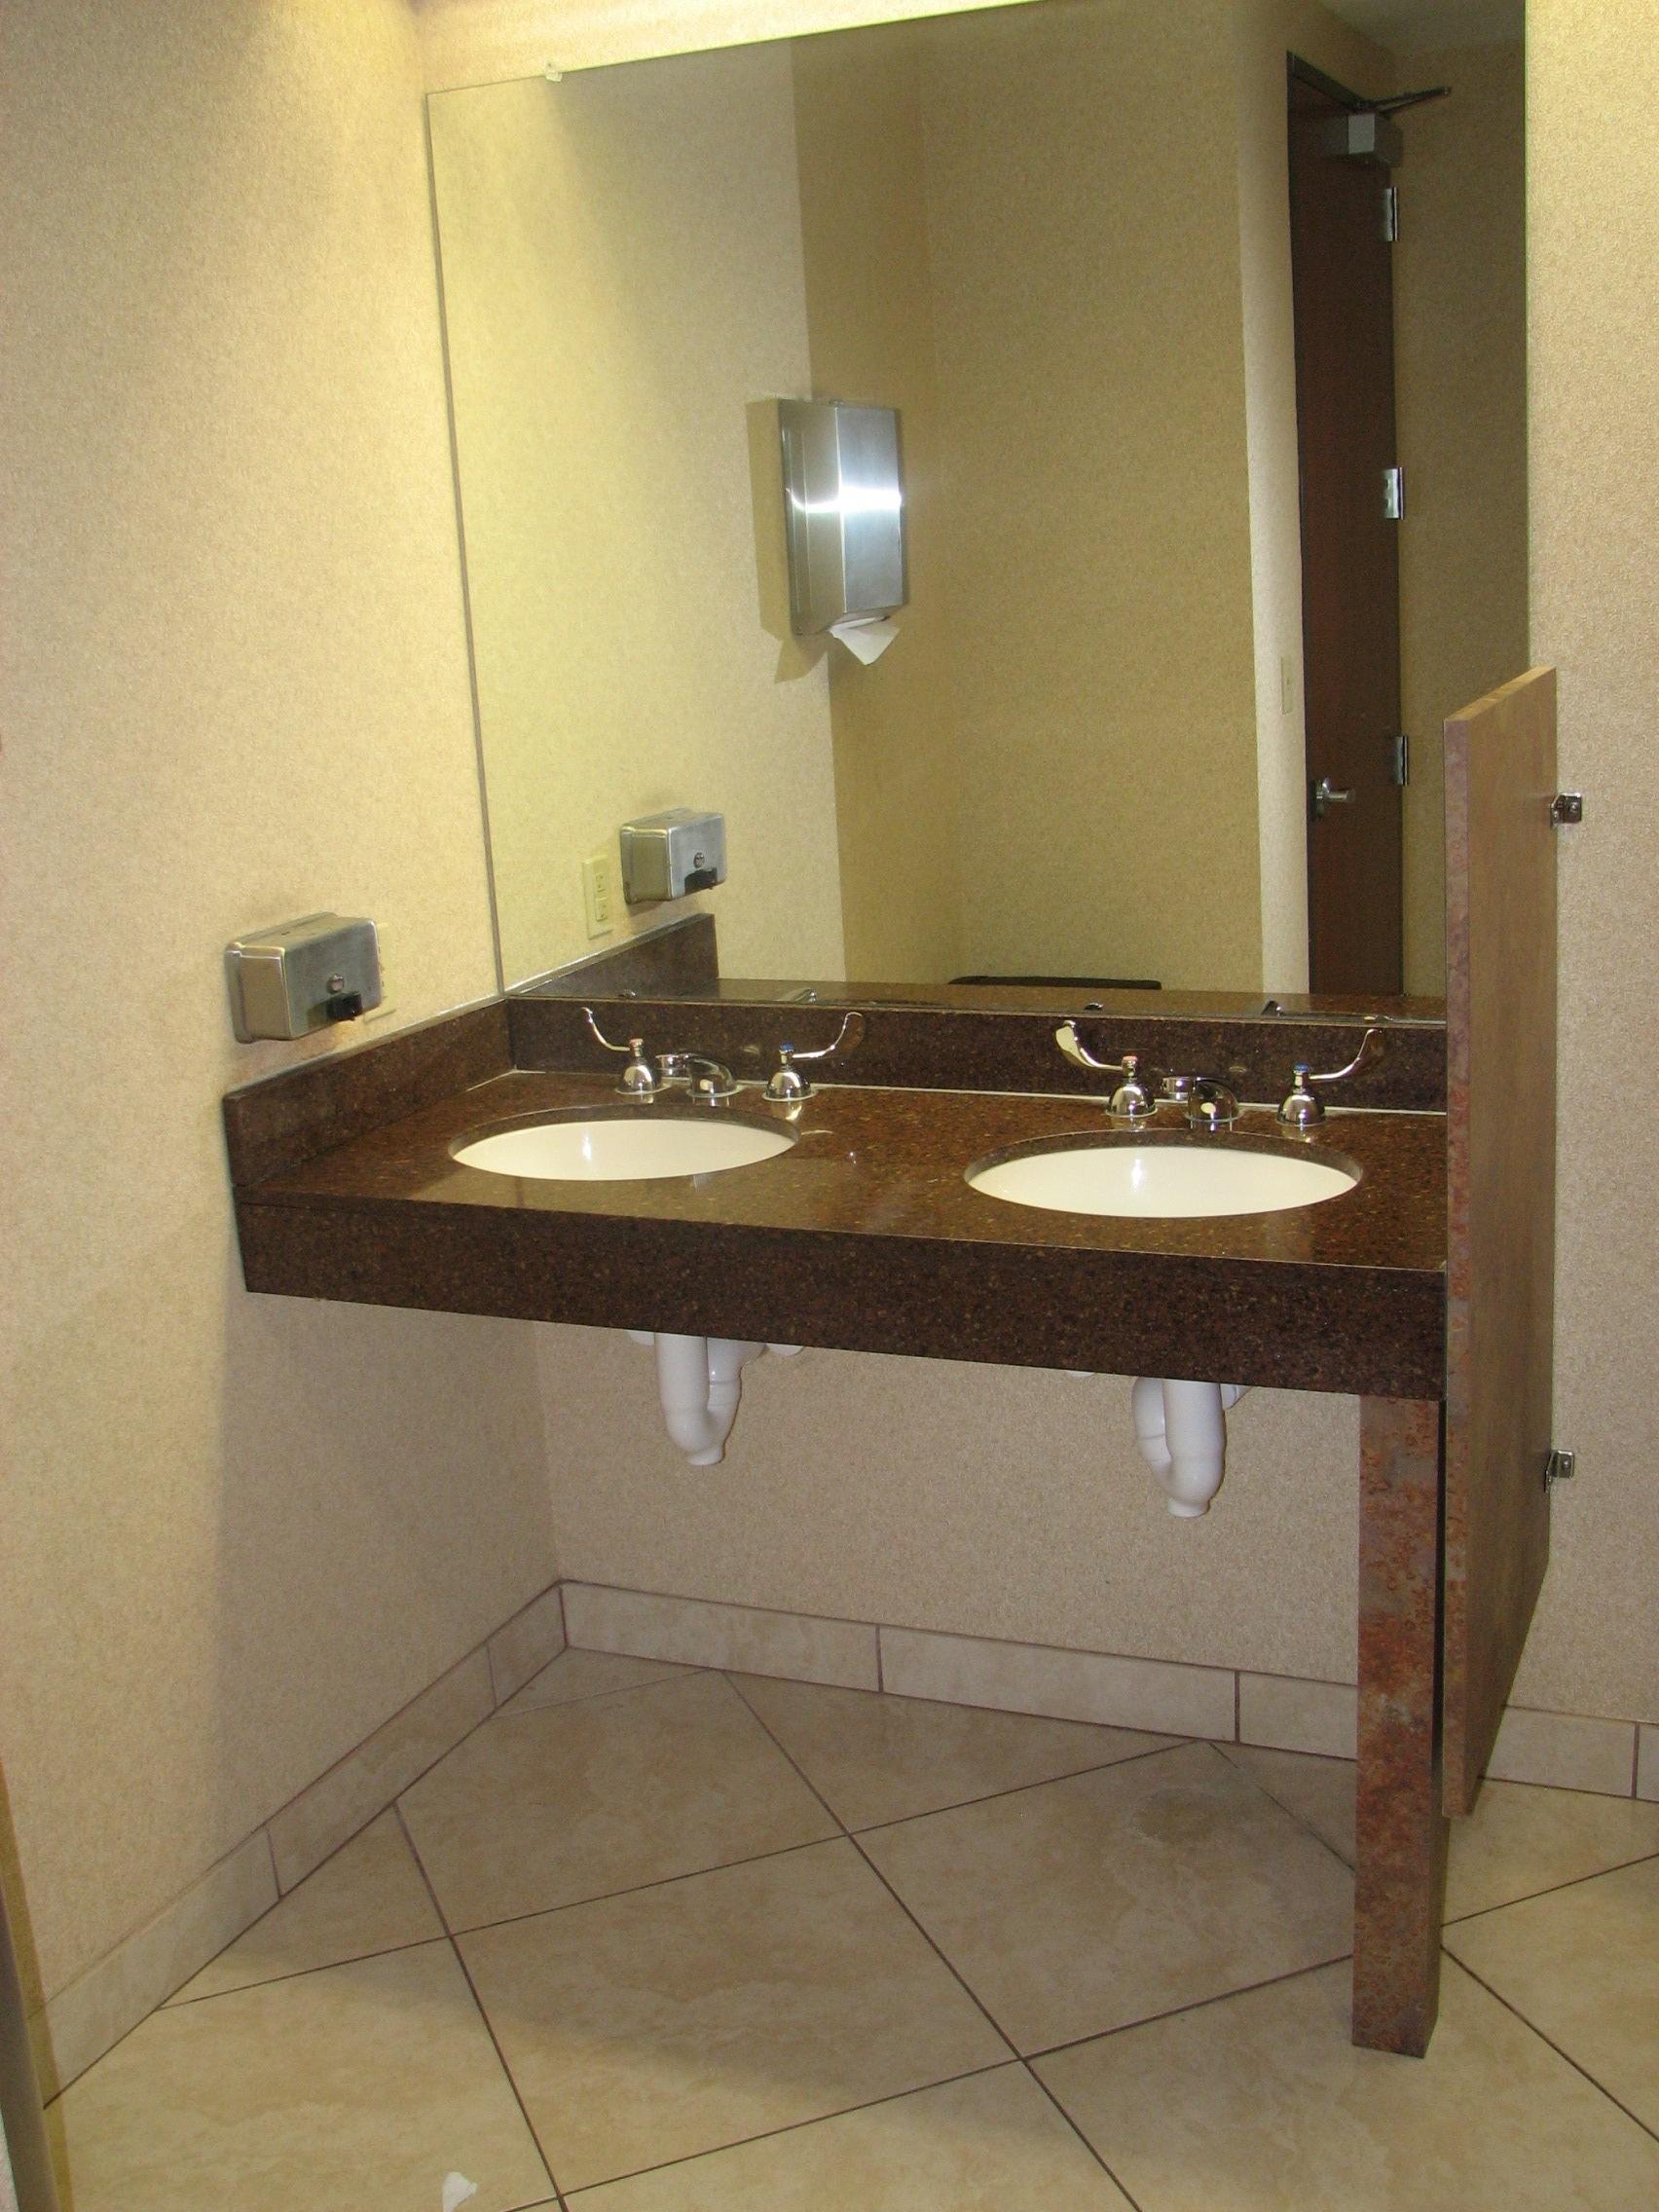 Wheelchair Accessible Bathrooms In Austin Texas - Bathroom remodeling austin texas